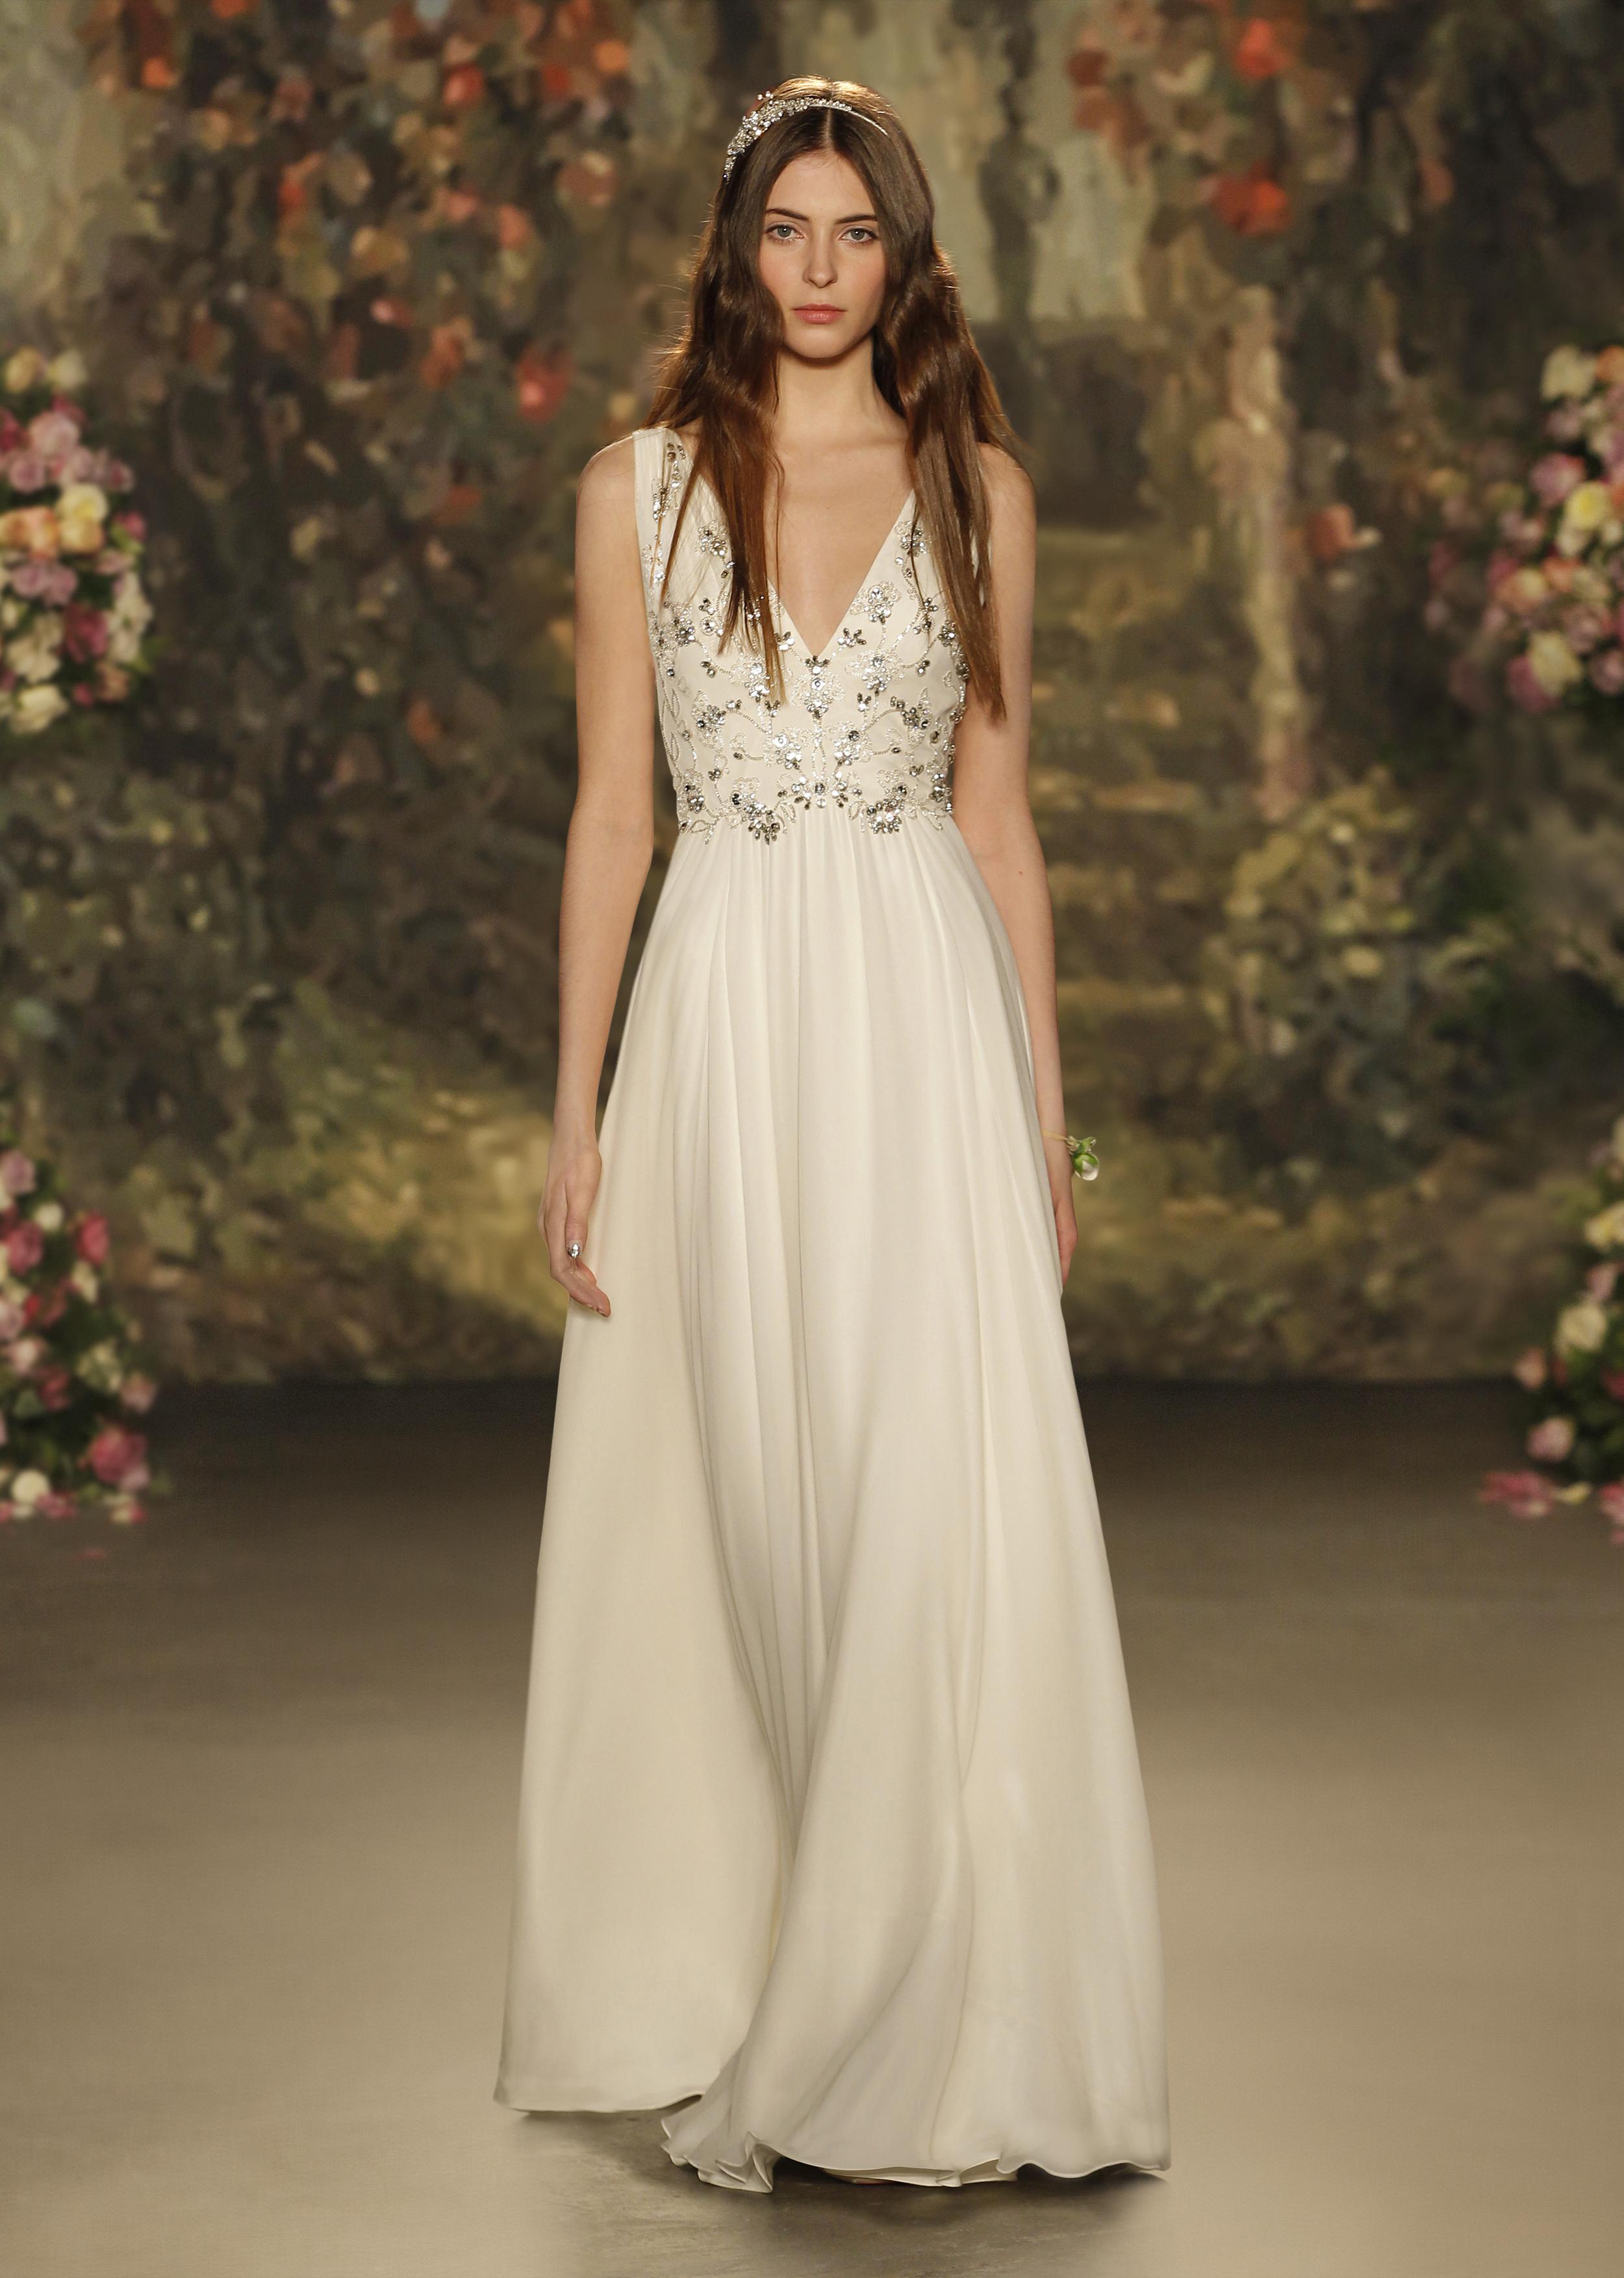 Jenny Packham wedding gown at Little White Dress Bridal Shop in Denver, Colorado